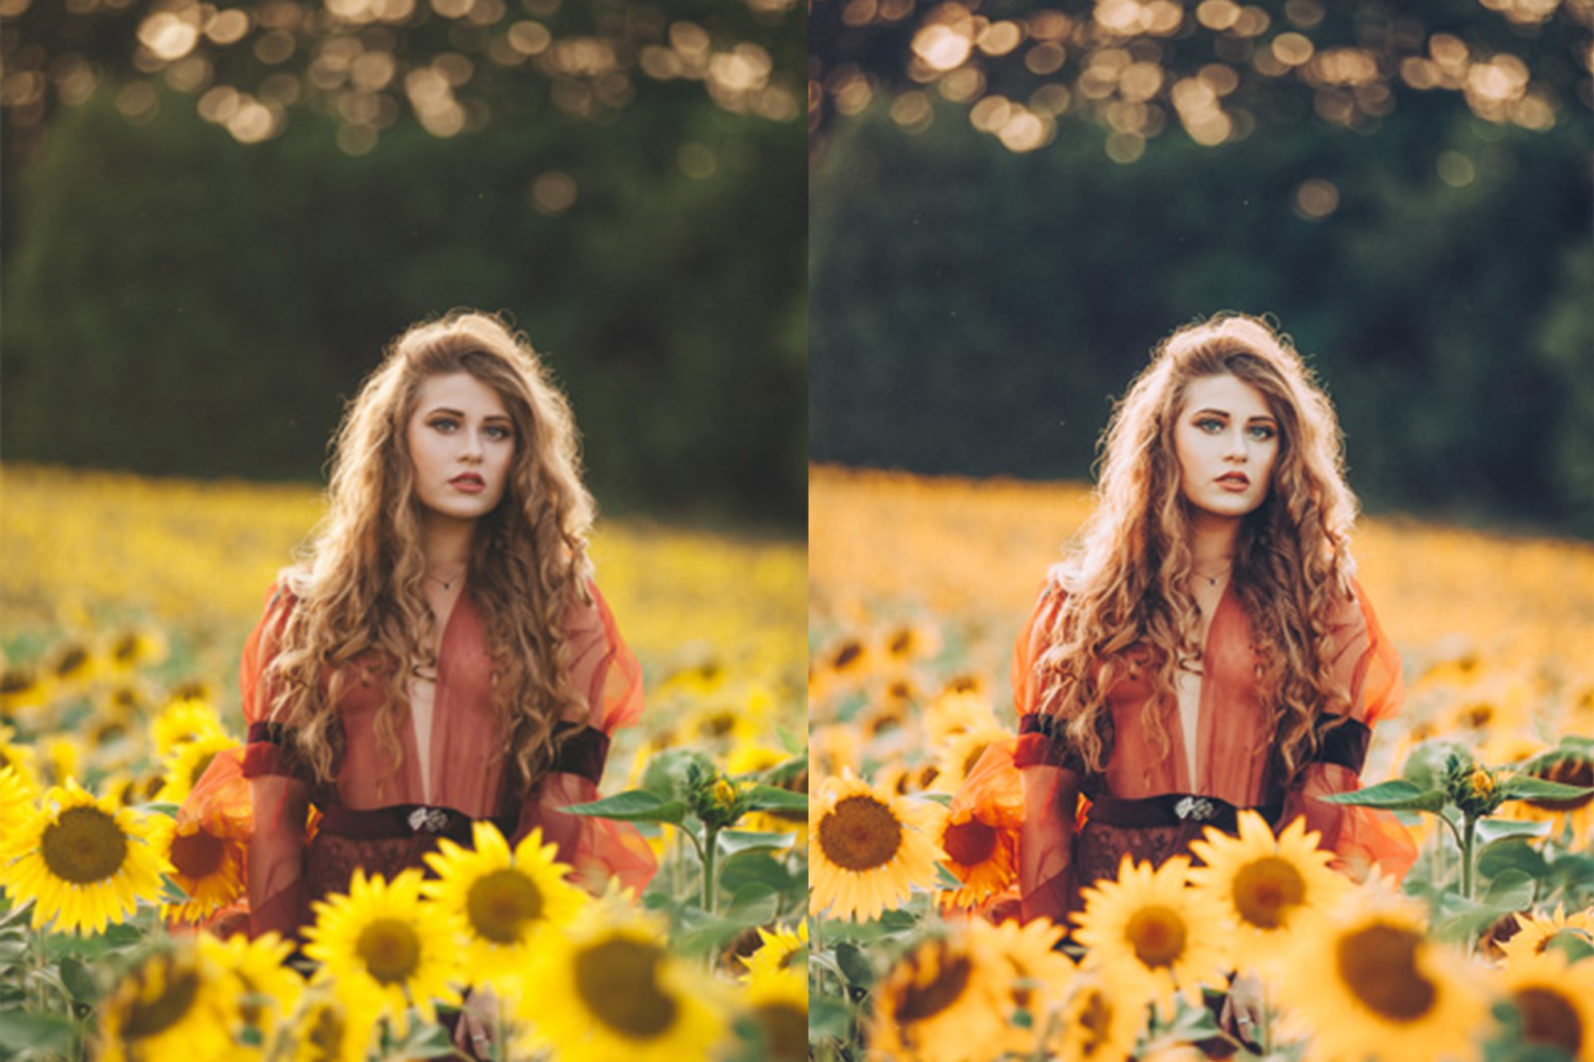 65 x Lightroom Presets (Mobile and Desktop Bundle) inspired by Spring - 12 Sunflower Fields -